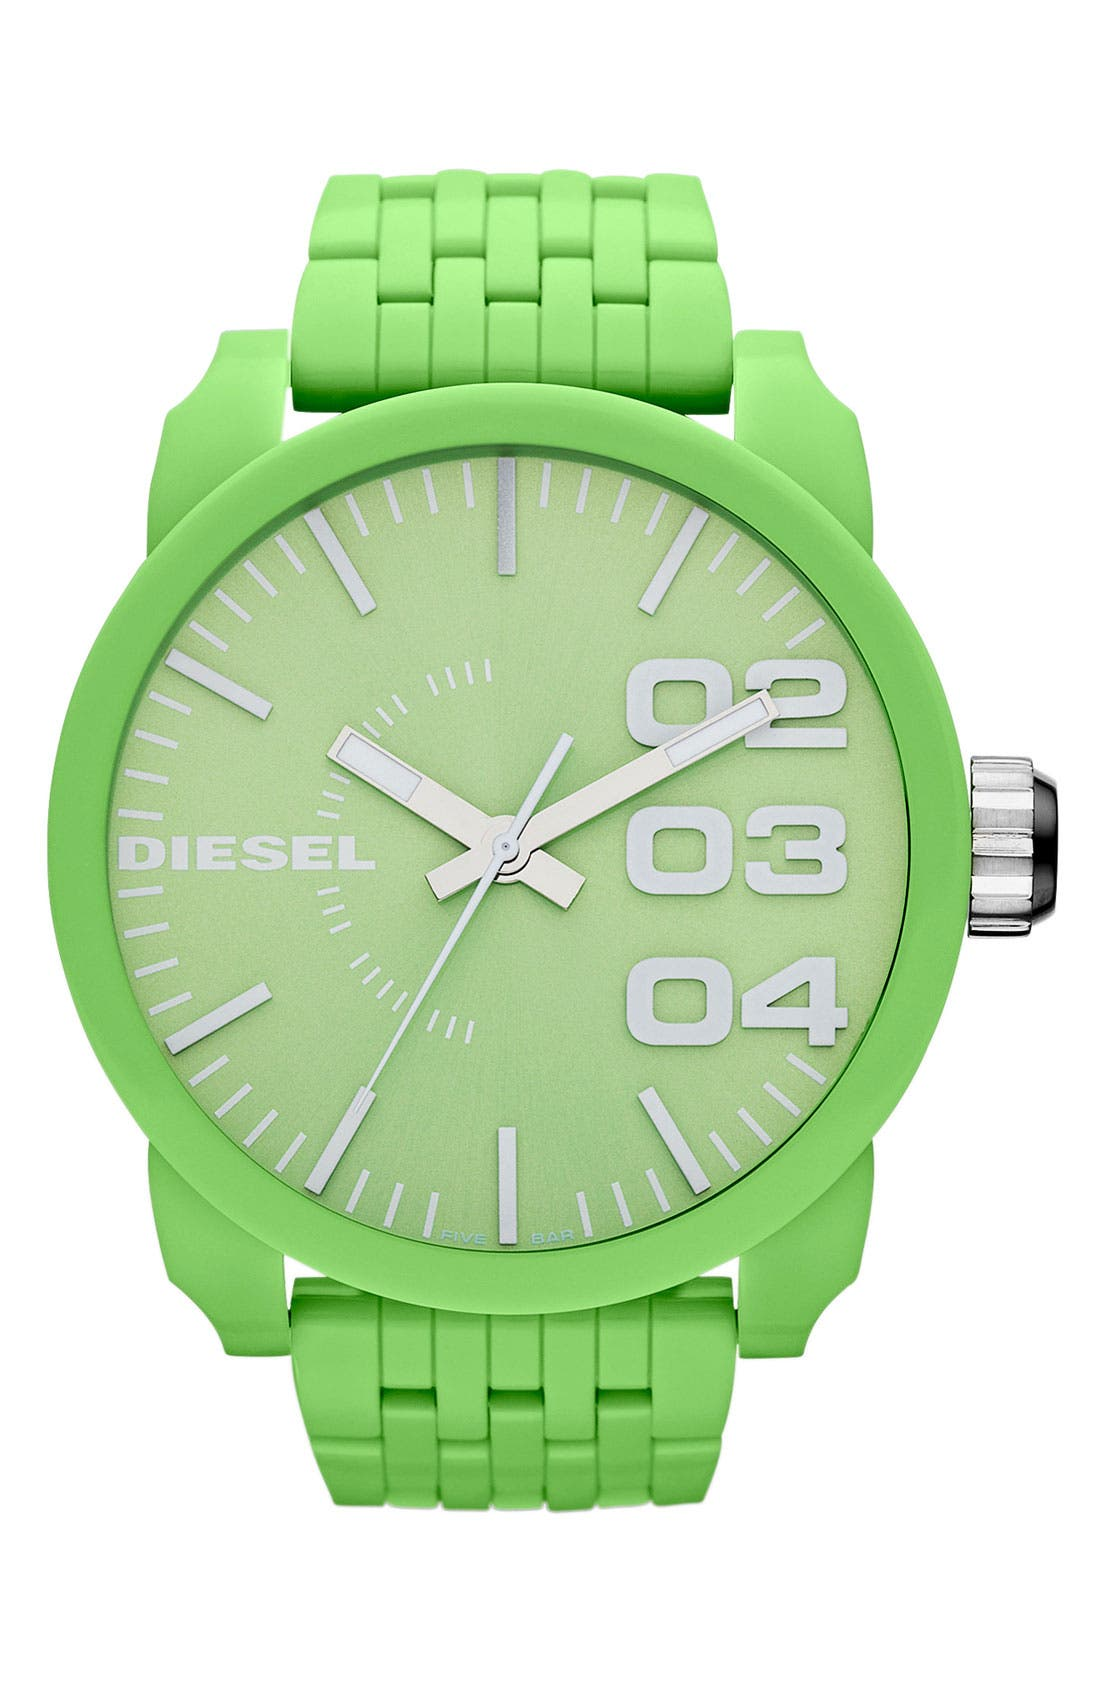 Alternate Image 1 Selected - DIESEL® 'Franchise' Oversized Round Bracelet Watch, 59mm x 67mm